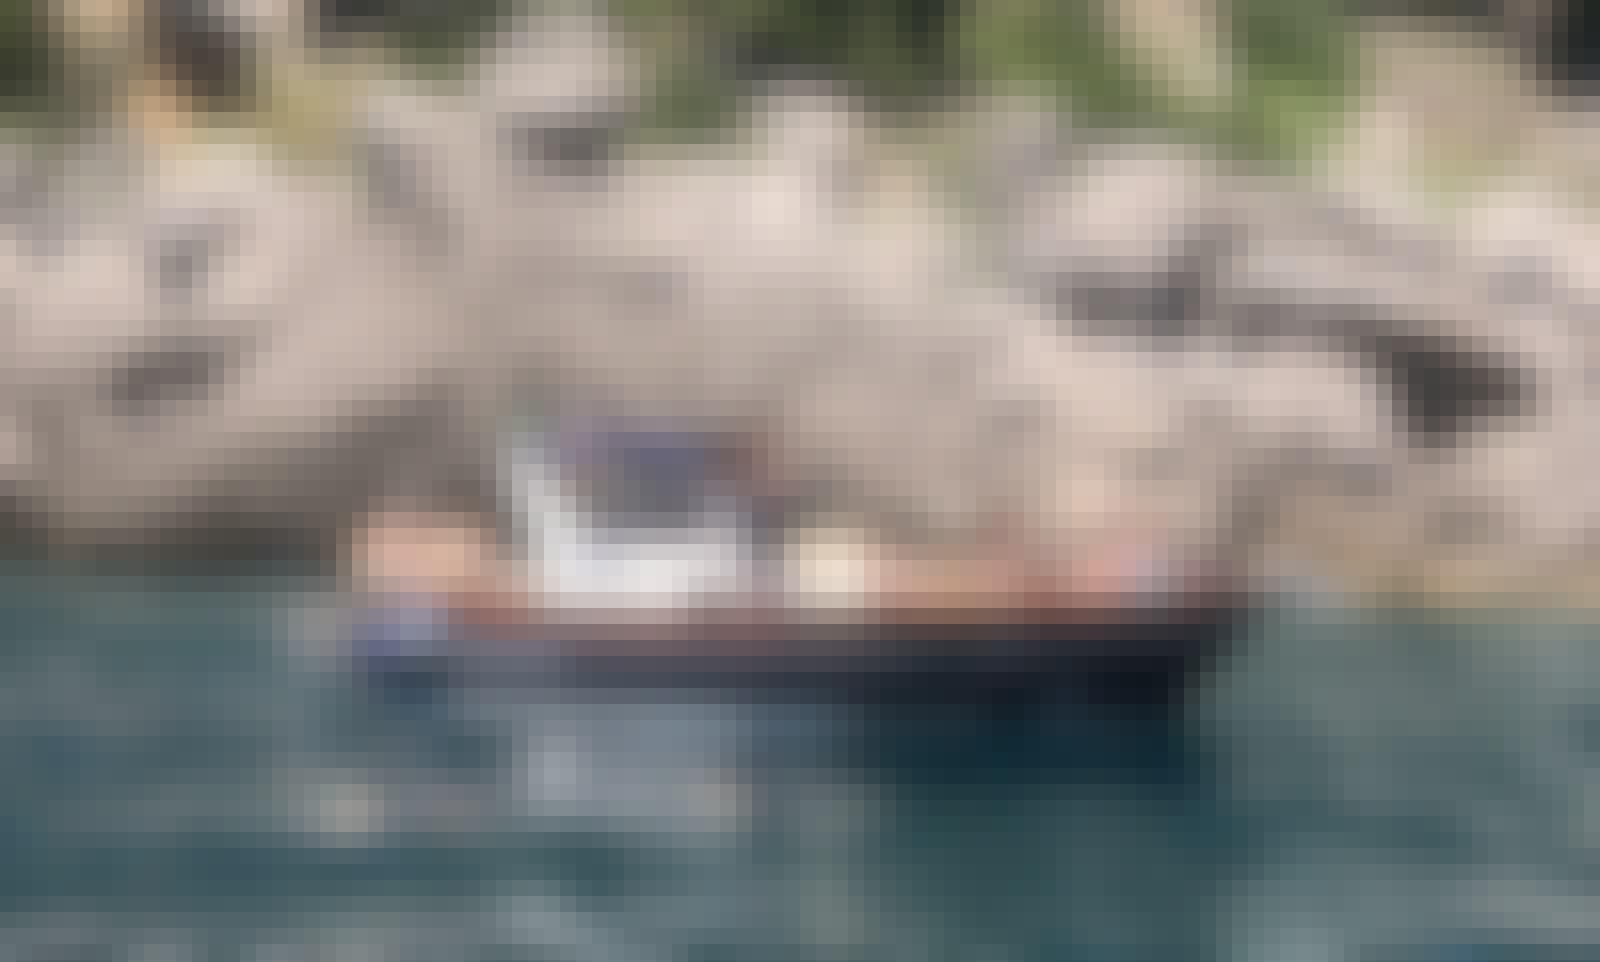 Live a Day on a Beautiful Coast onboard a 33' Apreamare Smeraldo 9 Luxury Gozzo from Positano, Italy!